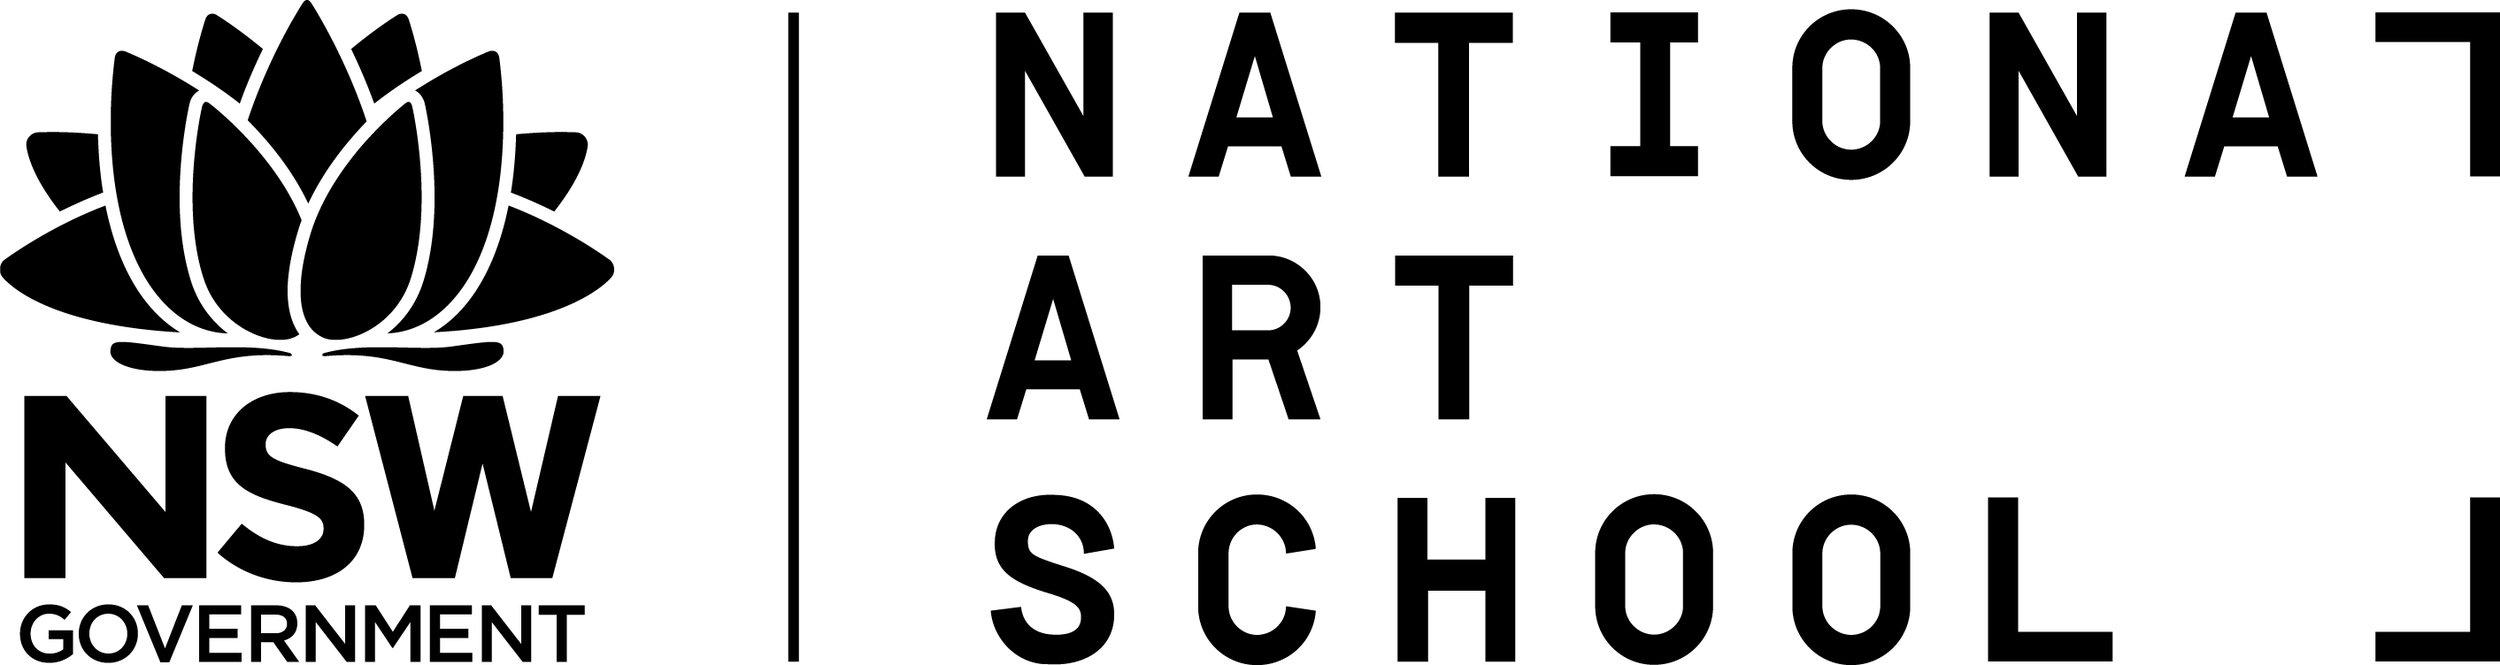 NAS Arts NSW lockup 2018 rich black.jpg